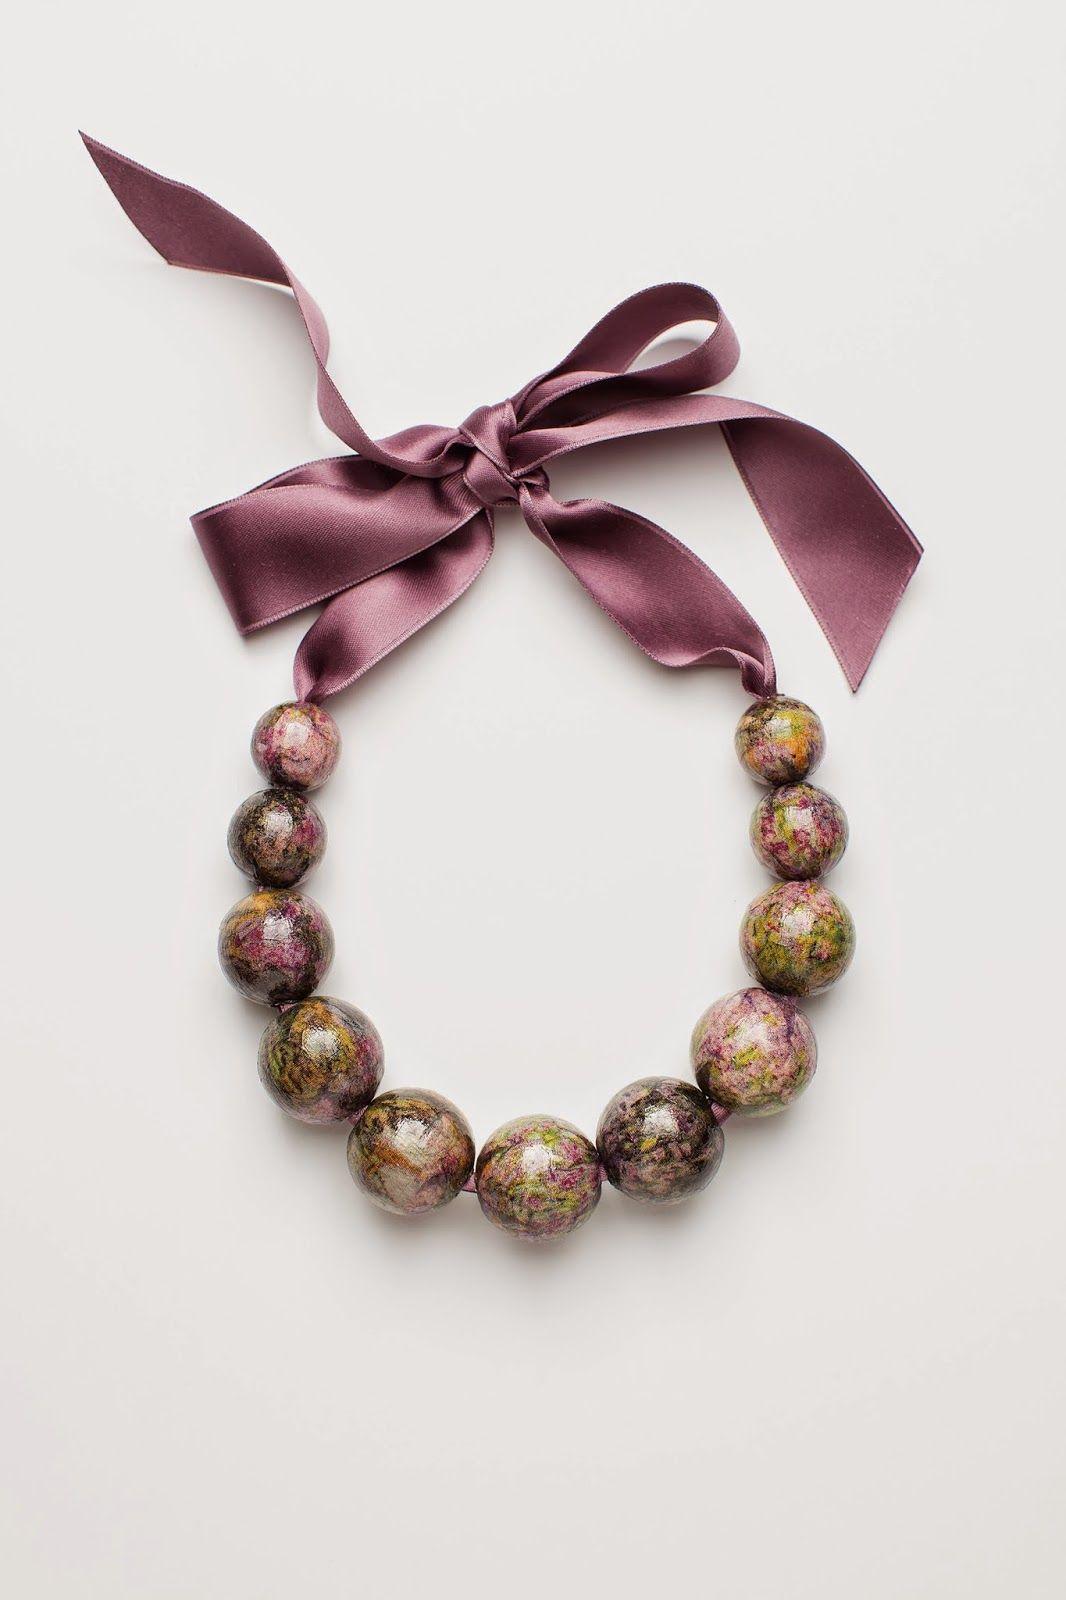 L'ah! Necklace ♥ Unique Handmade Jewelry